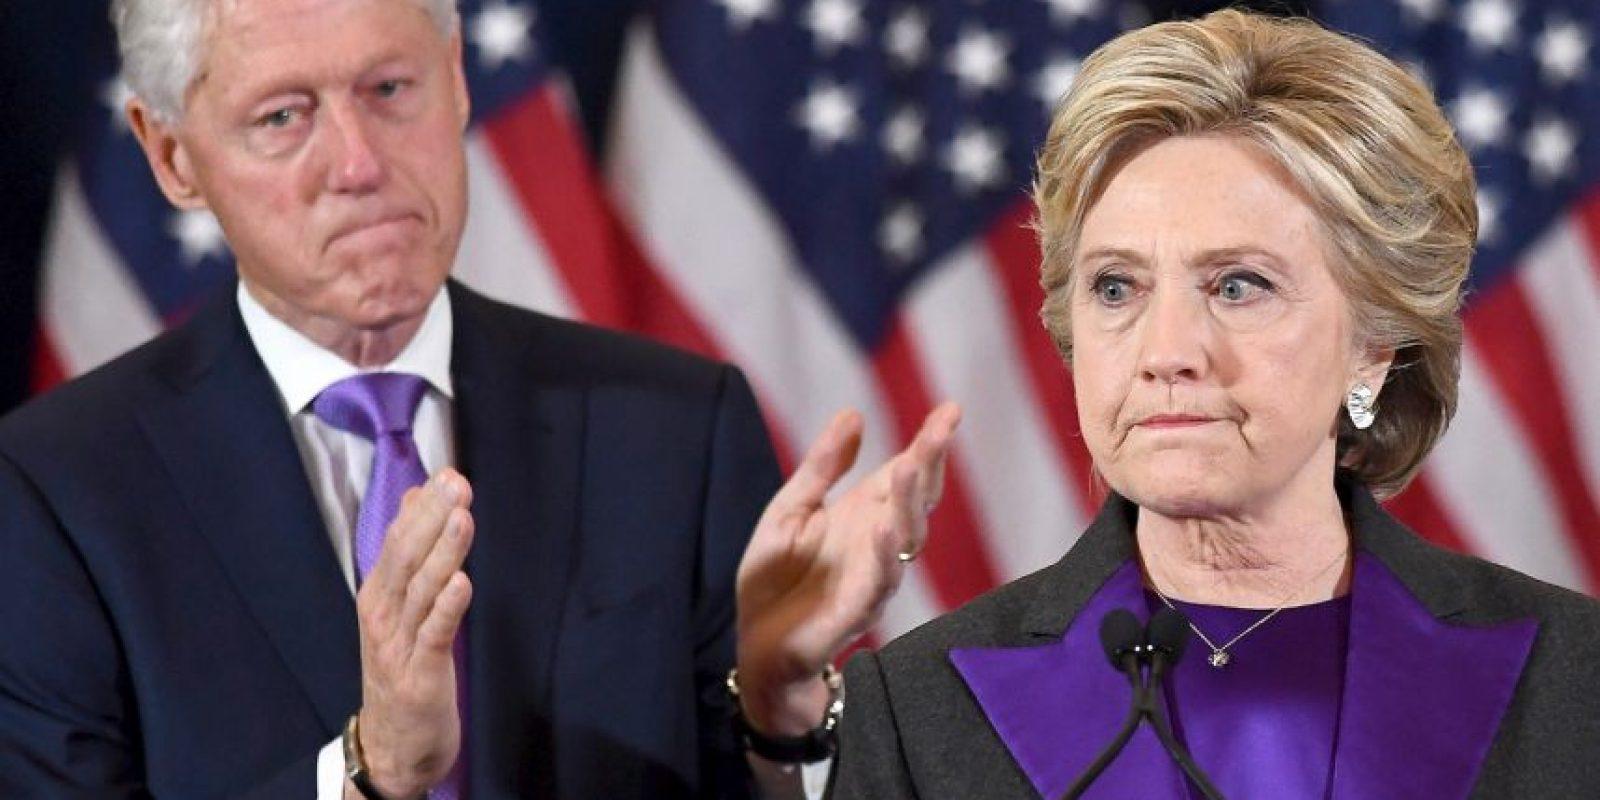 Hillary Clinton aceptó su derrota esta mañana Foto:AFP